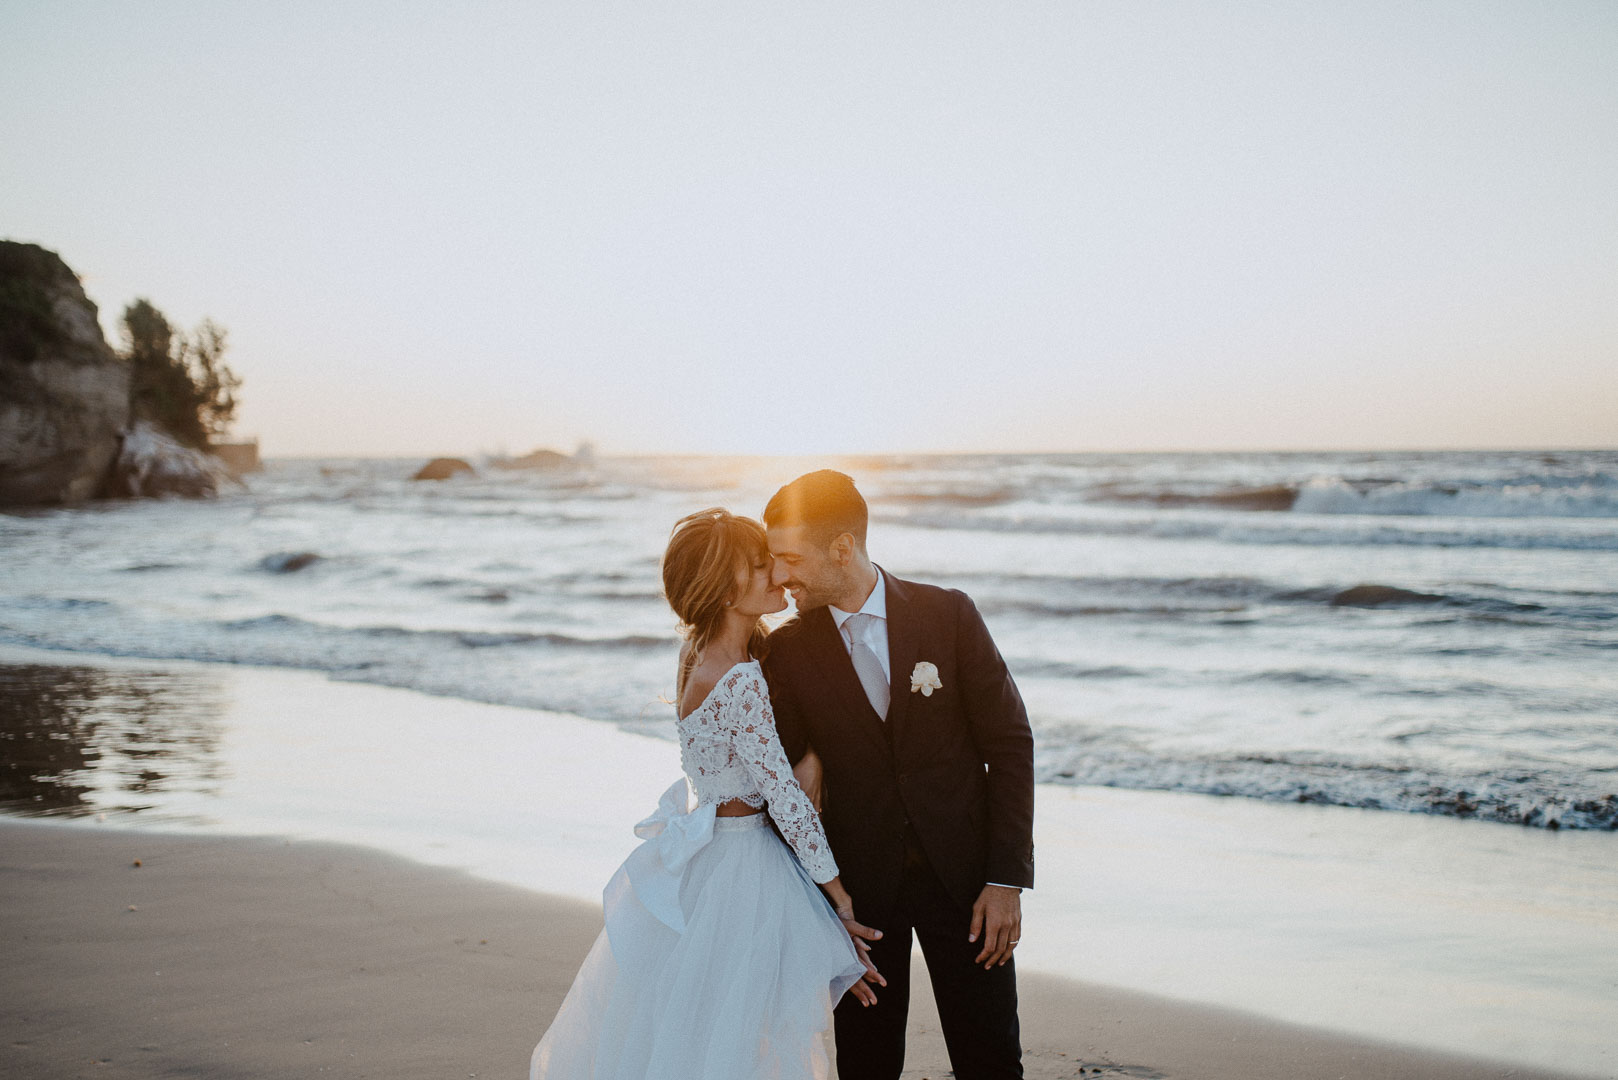 wedding-photographer-destination-fineart-bespoke-reportage-napoli-nabilah-vivianeizzo-spazio46-136